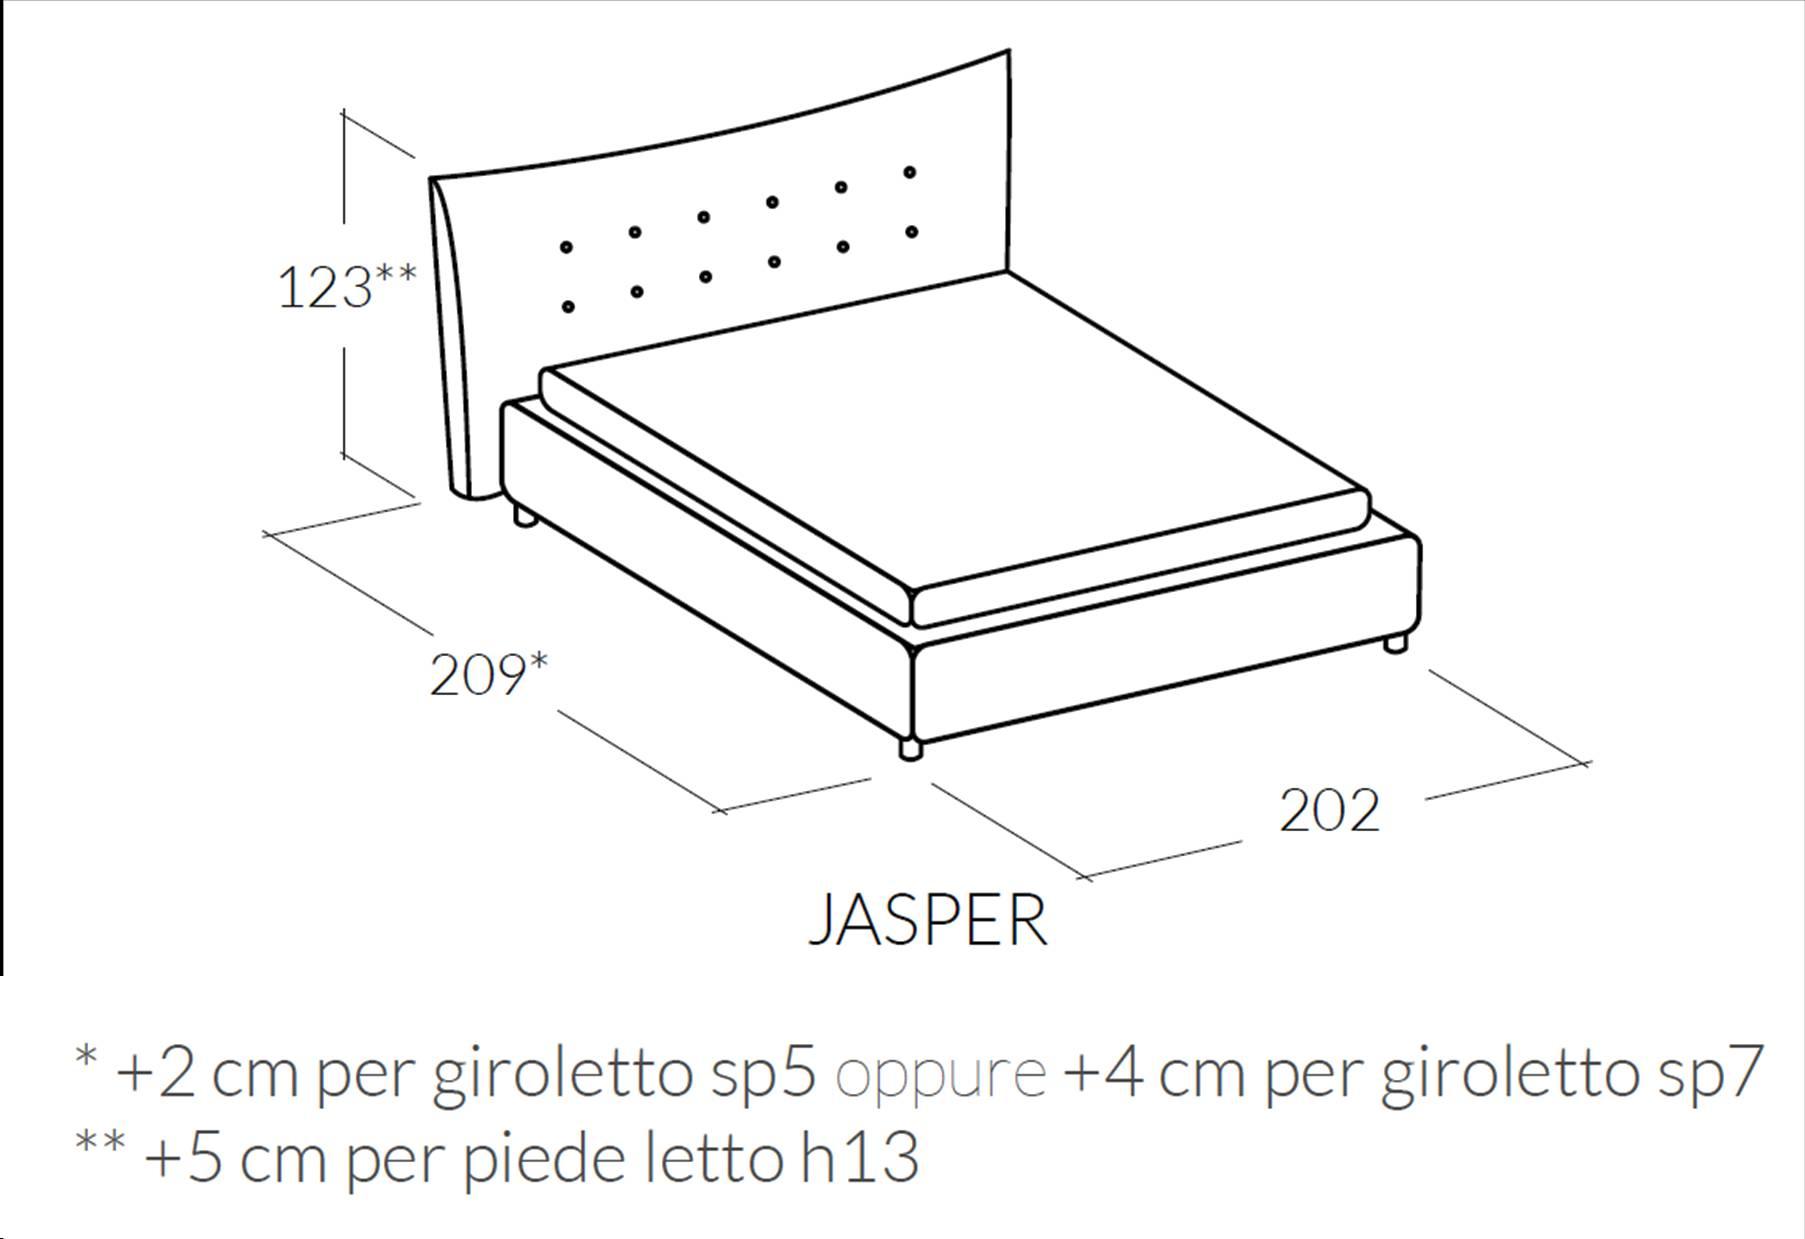 technisches_blatt_bed_maxhome_model_jasper_ins